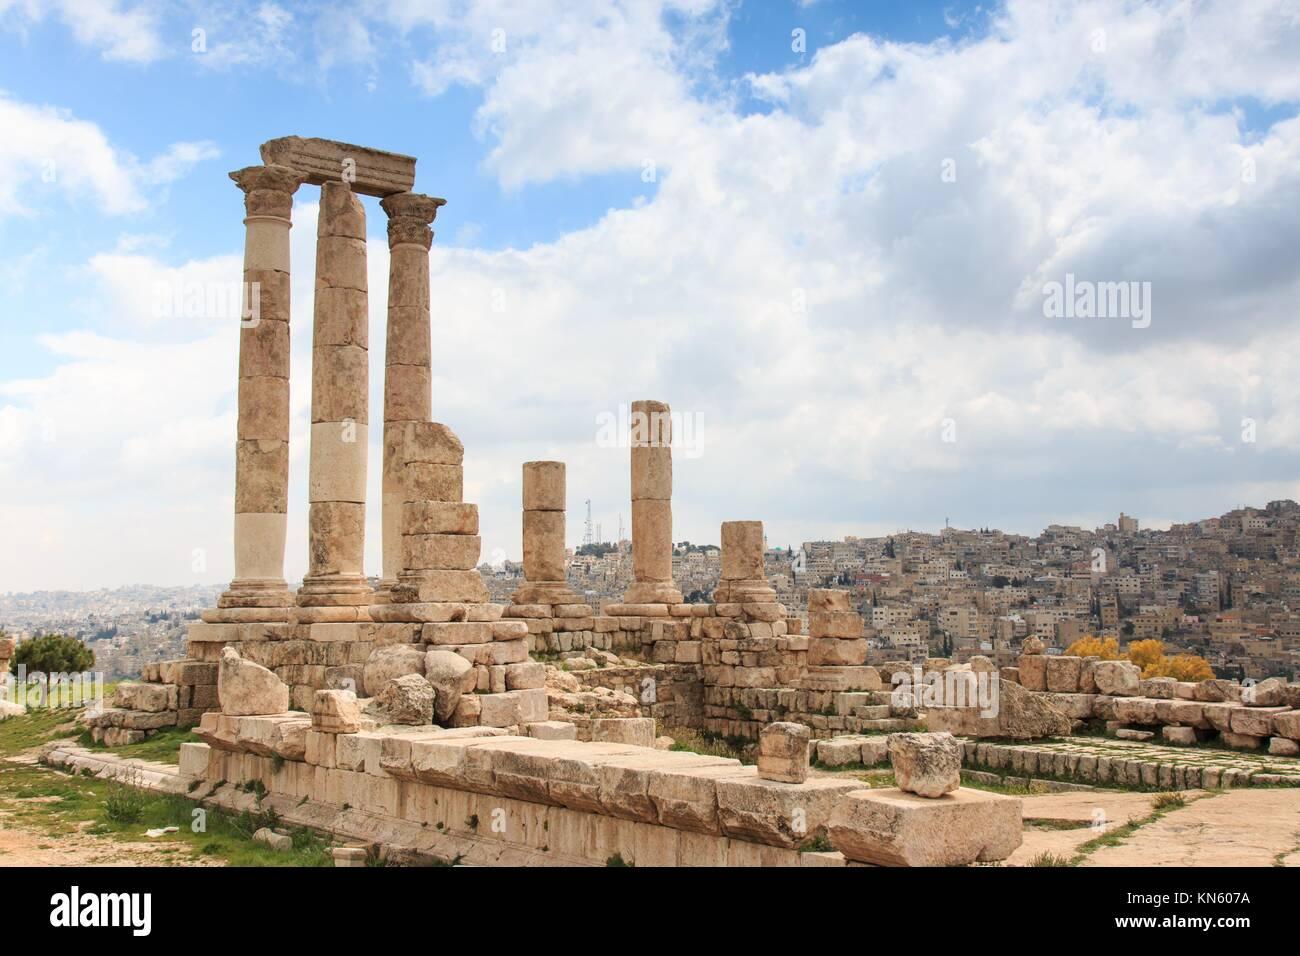 Les ruines de la Citadelle d'Amman en Jordanie. Photo Stock